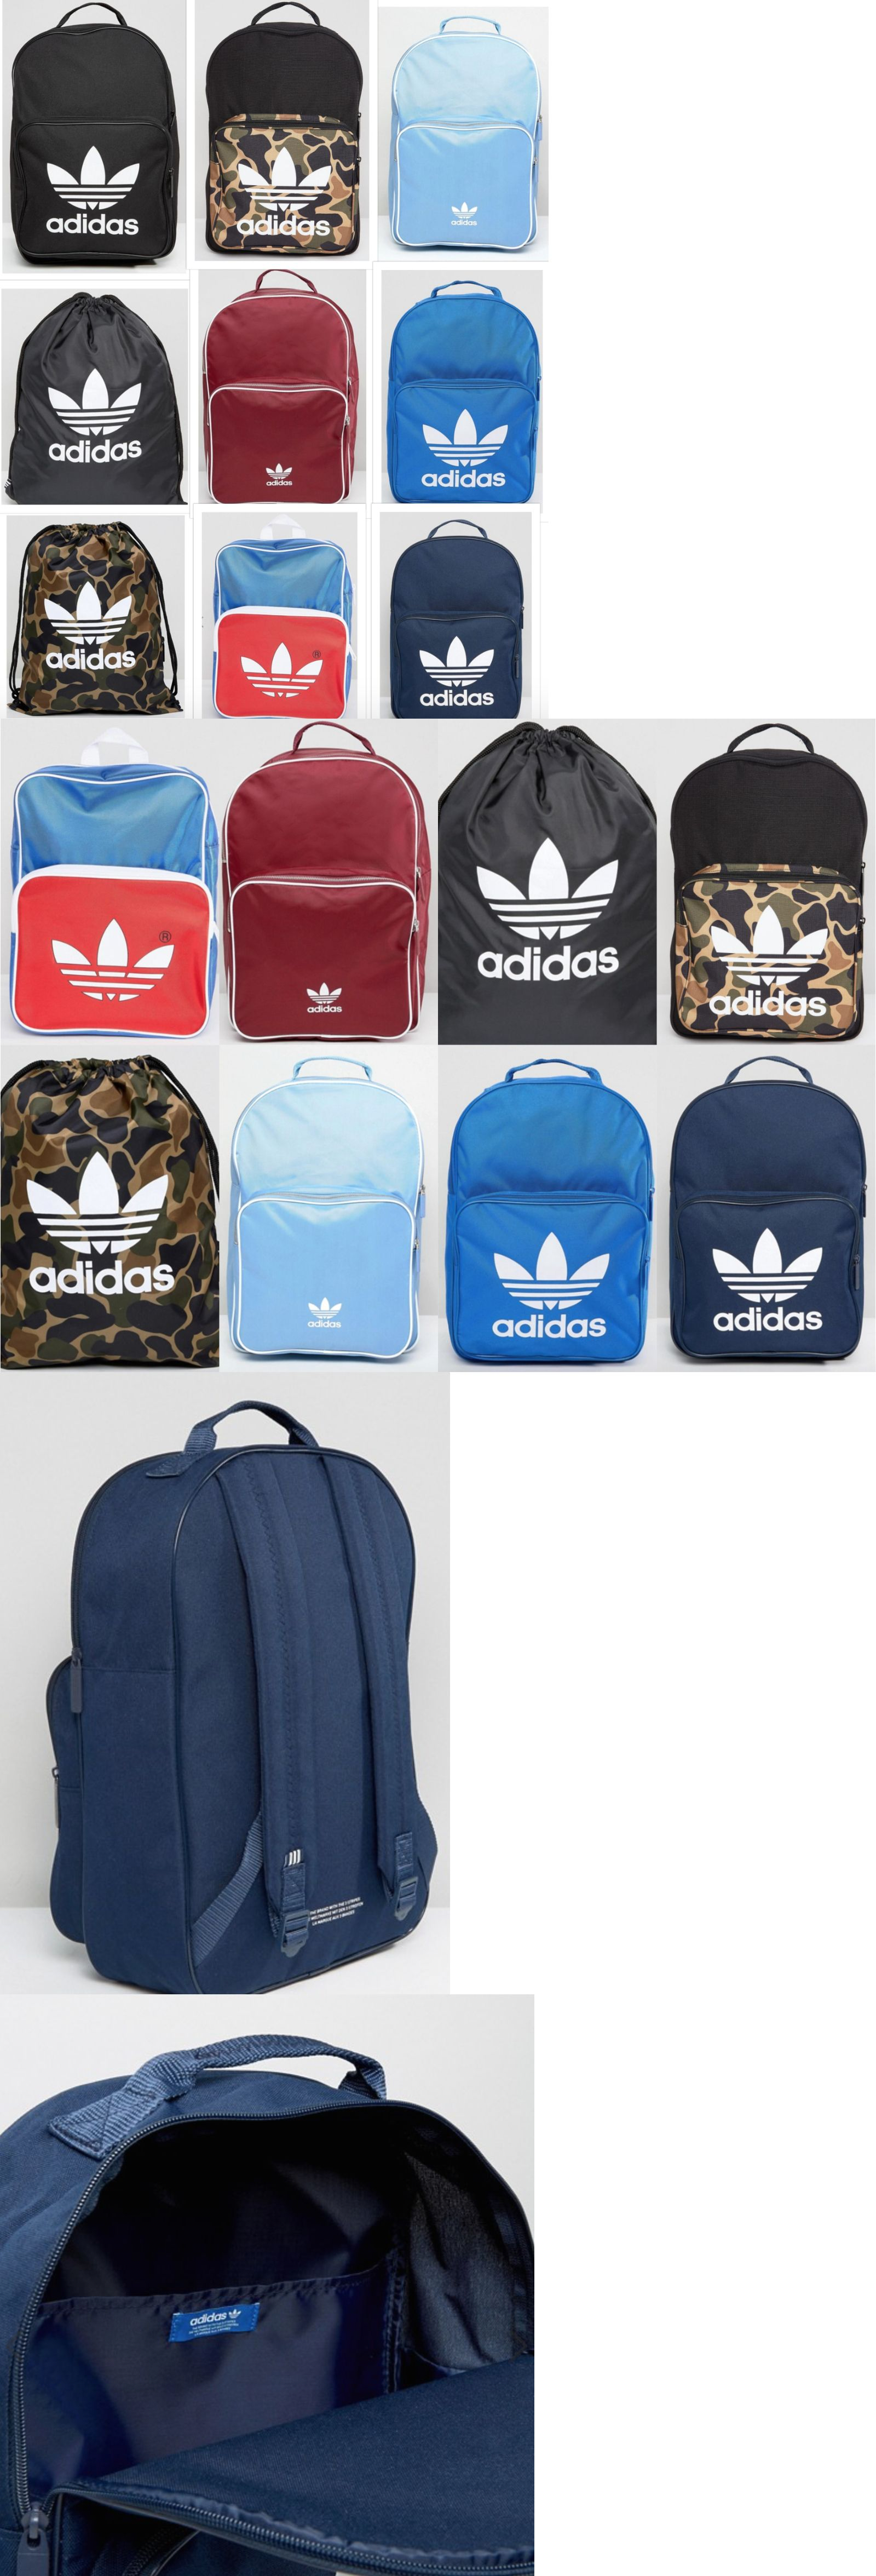 ... buy online efa6b 78ea8 Bags and Backpacks 163537 Adidas Originals  Trefoil Logo Backpack Classic Book Bag ... 0d2425c0ce